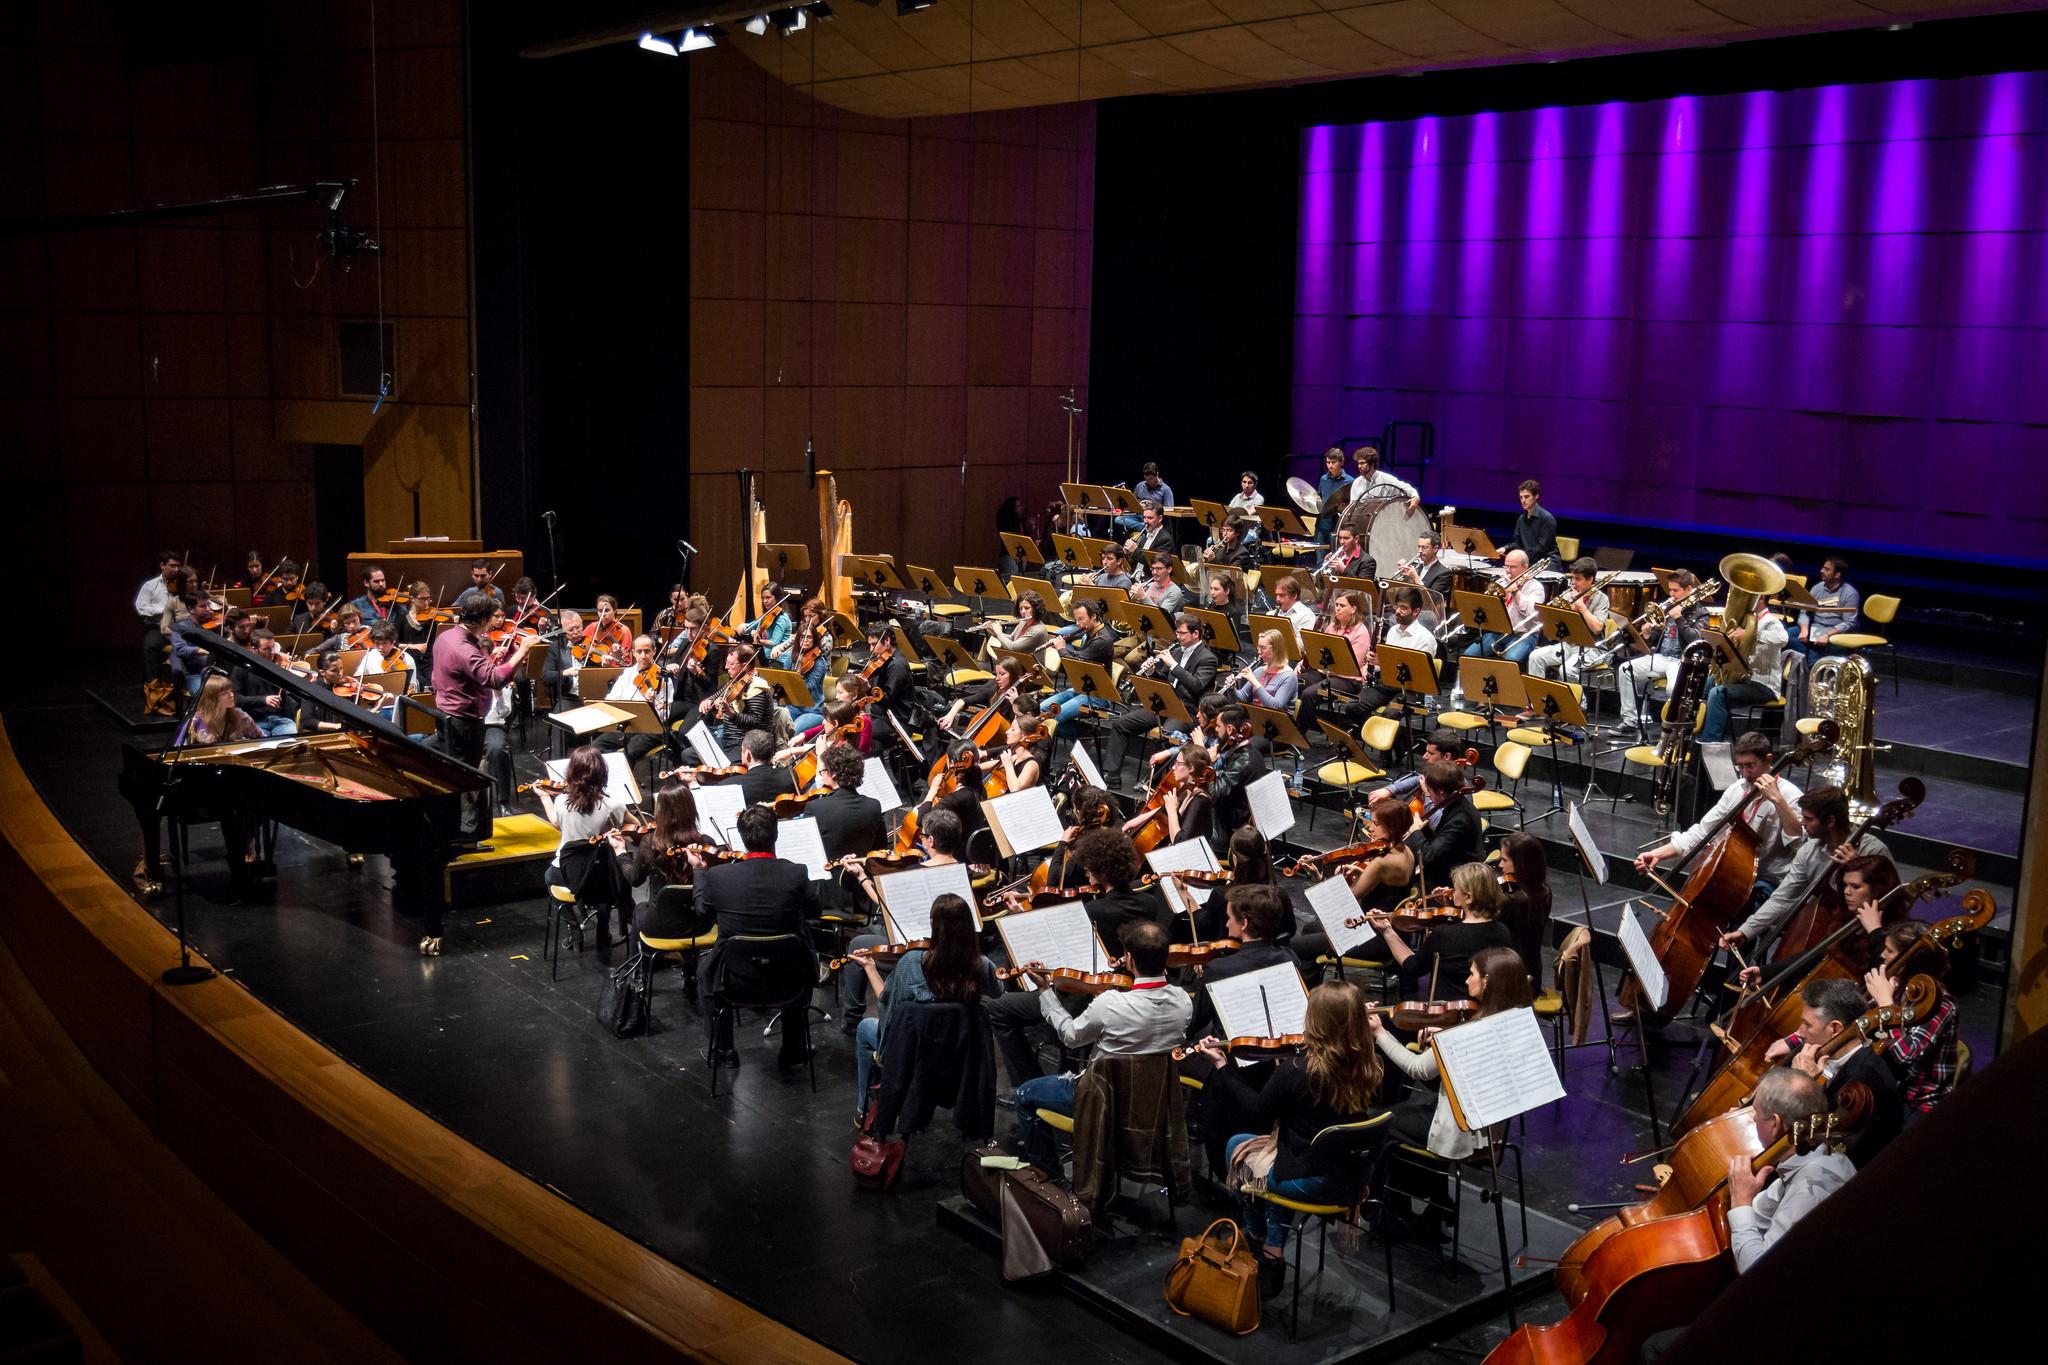 A1 Orquestra Sinfonica Metropolitana_MG_7399-Edit.jpg